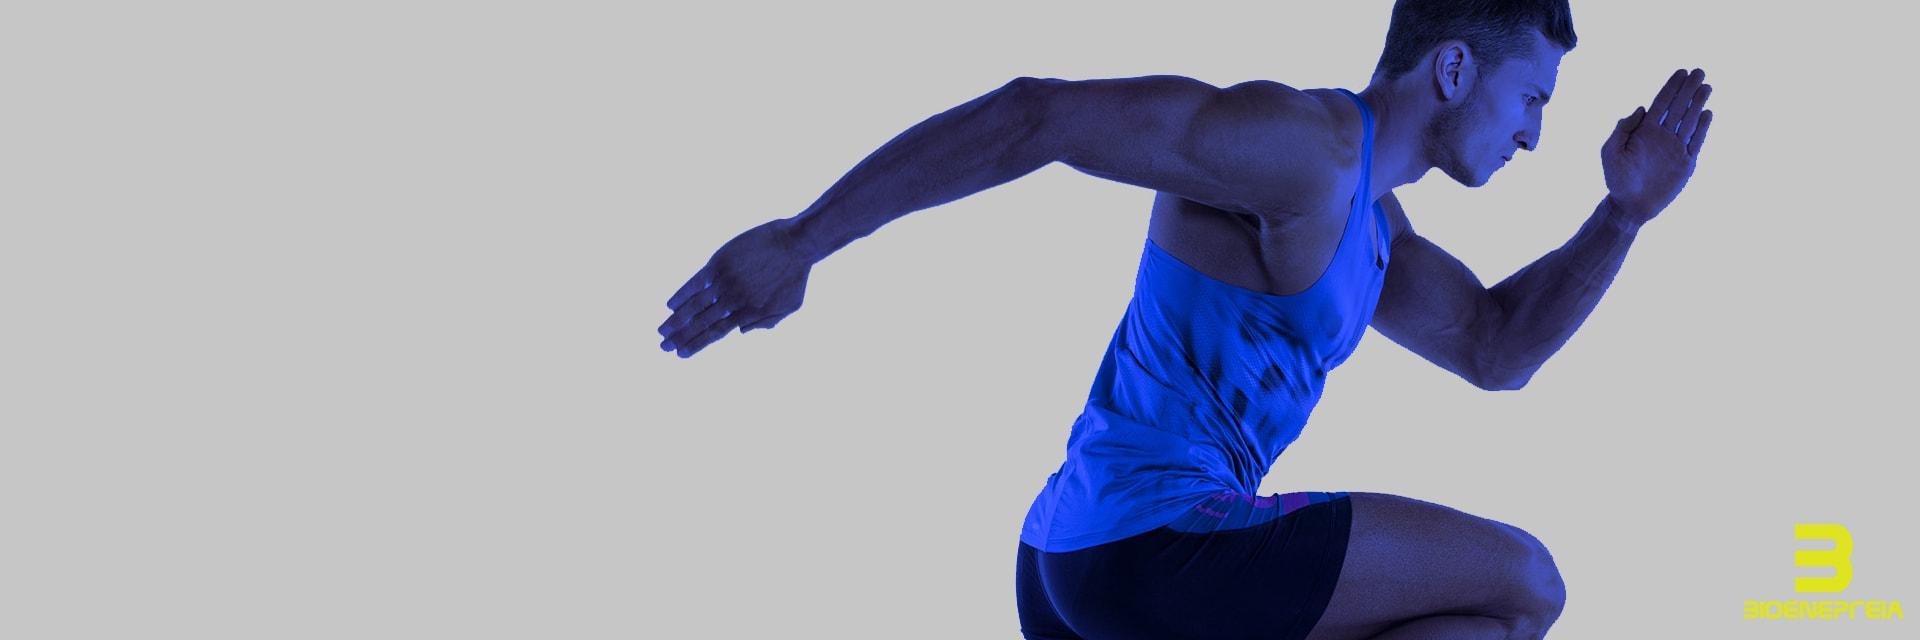 cardio-fitness-bioenergia-fc-gym-sparti